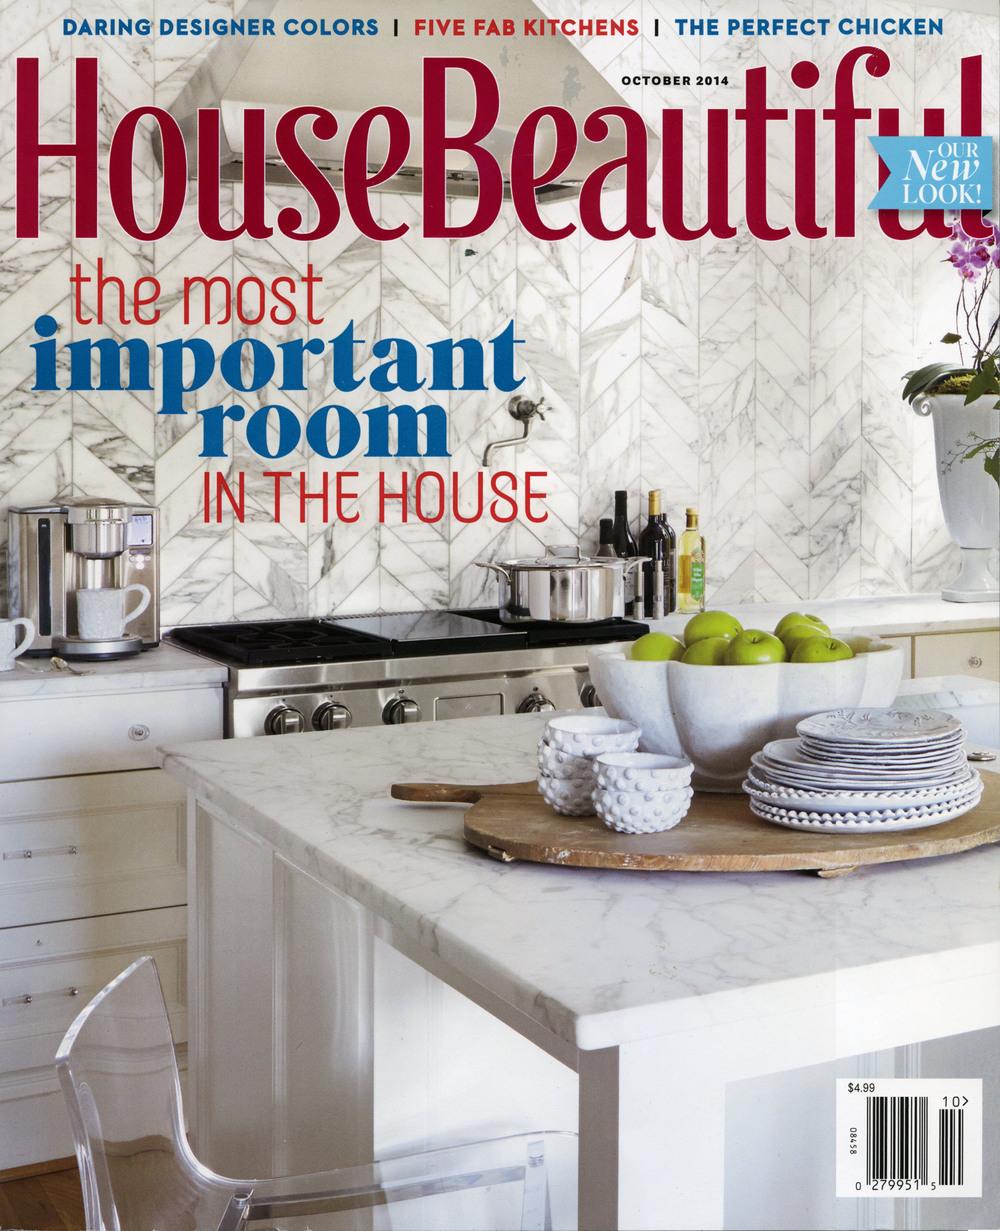 201410-HouseBeautiful-cover.jpg